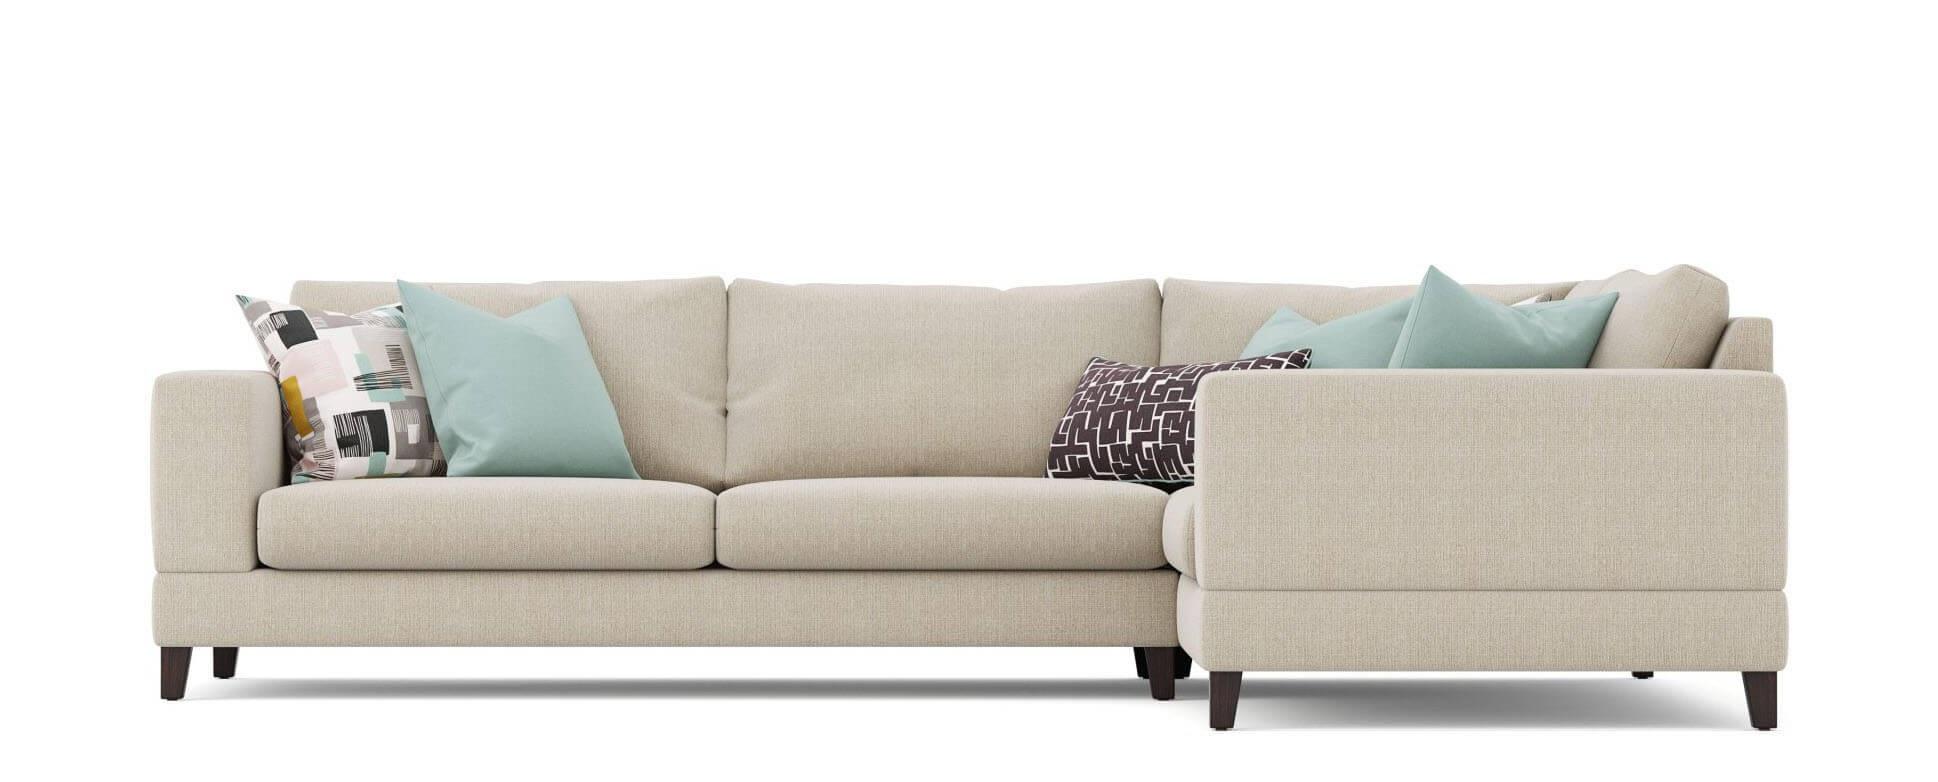 матрас дивана седафлекс